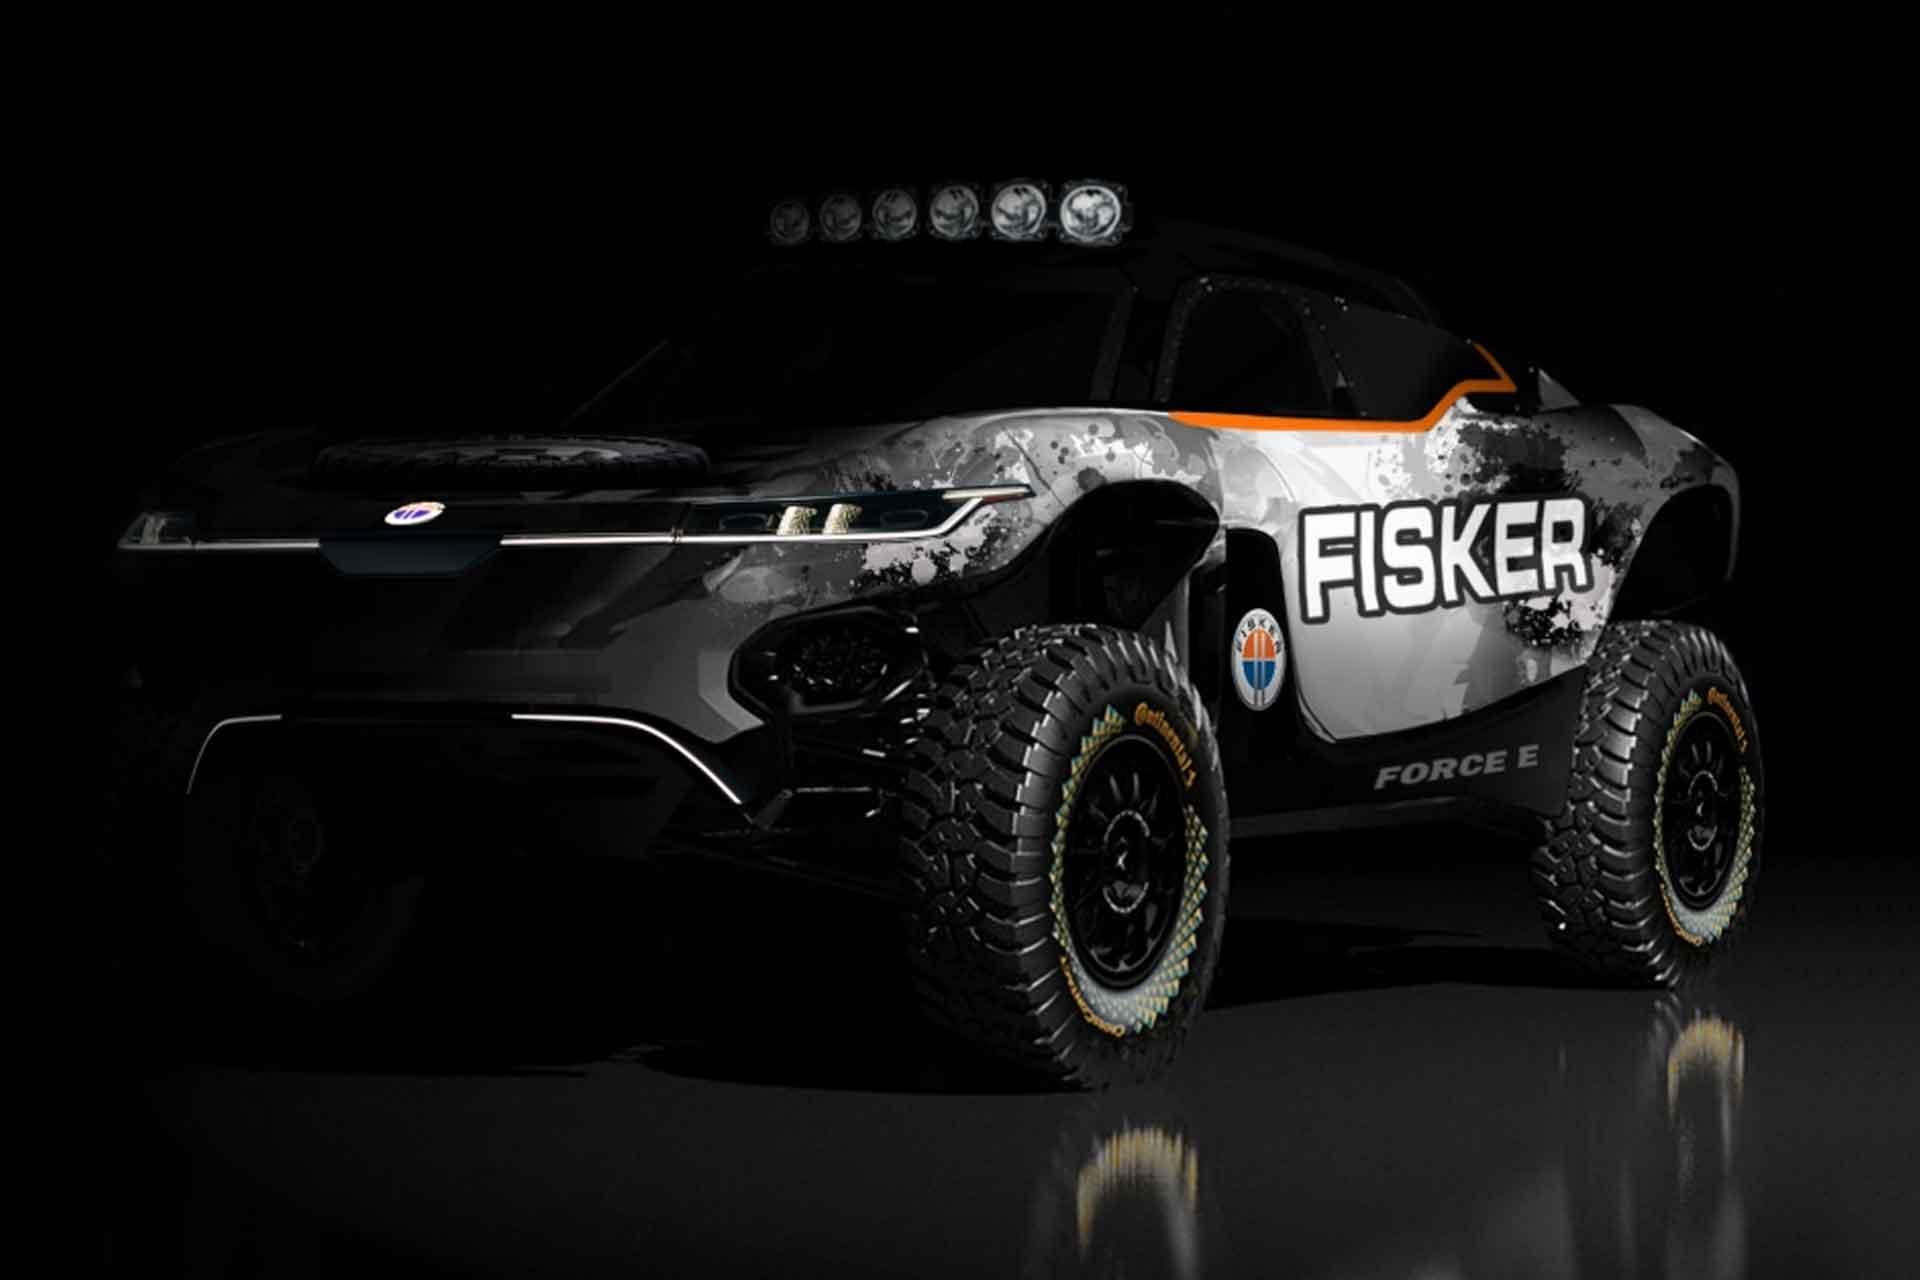 Fisker Extreme E Concept